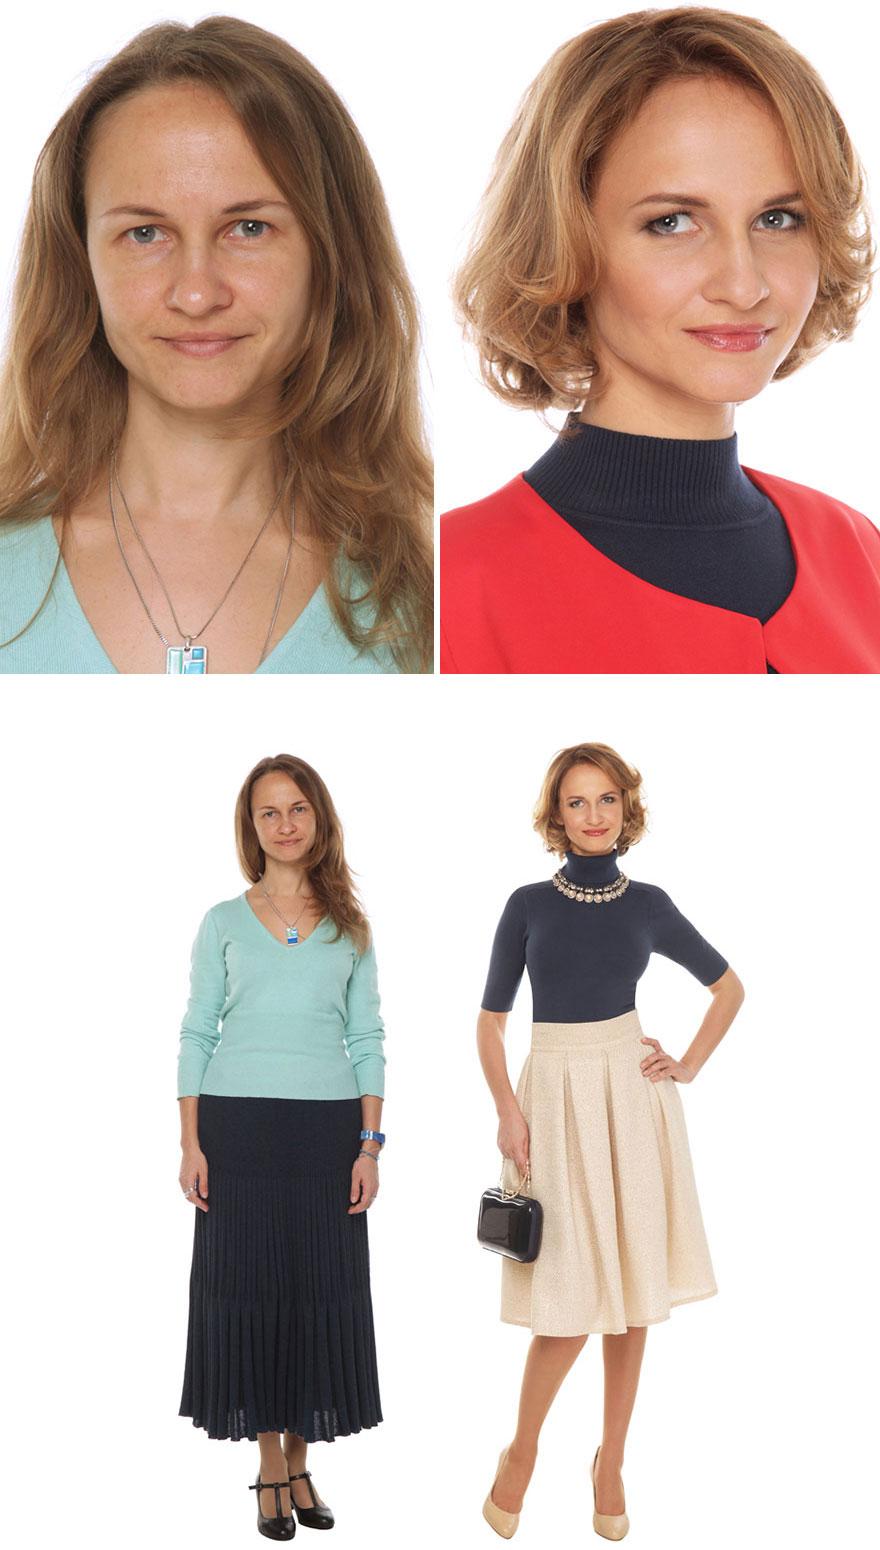 before-after-makeup-woman-style-change-konstantin-bogomolov-5